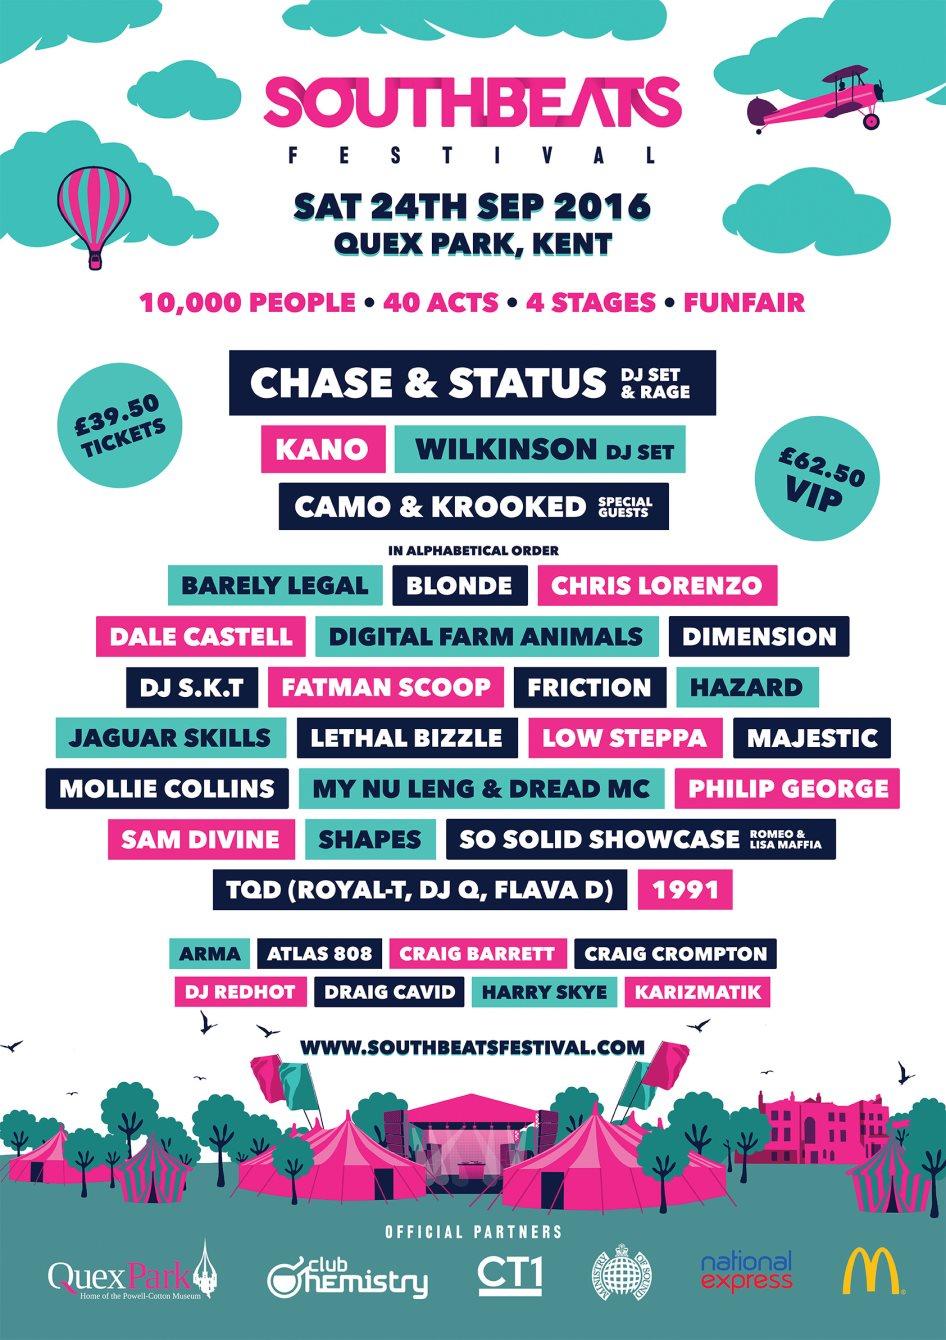 Ra Southbeats Festival At Quex Park South East 2016